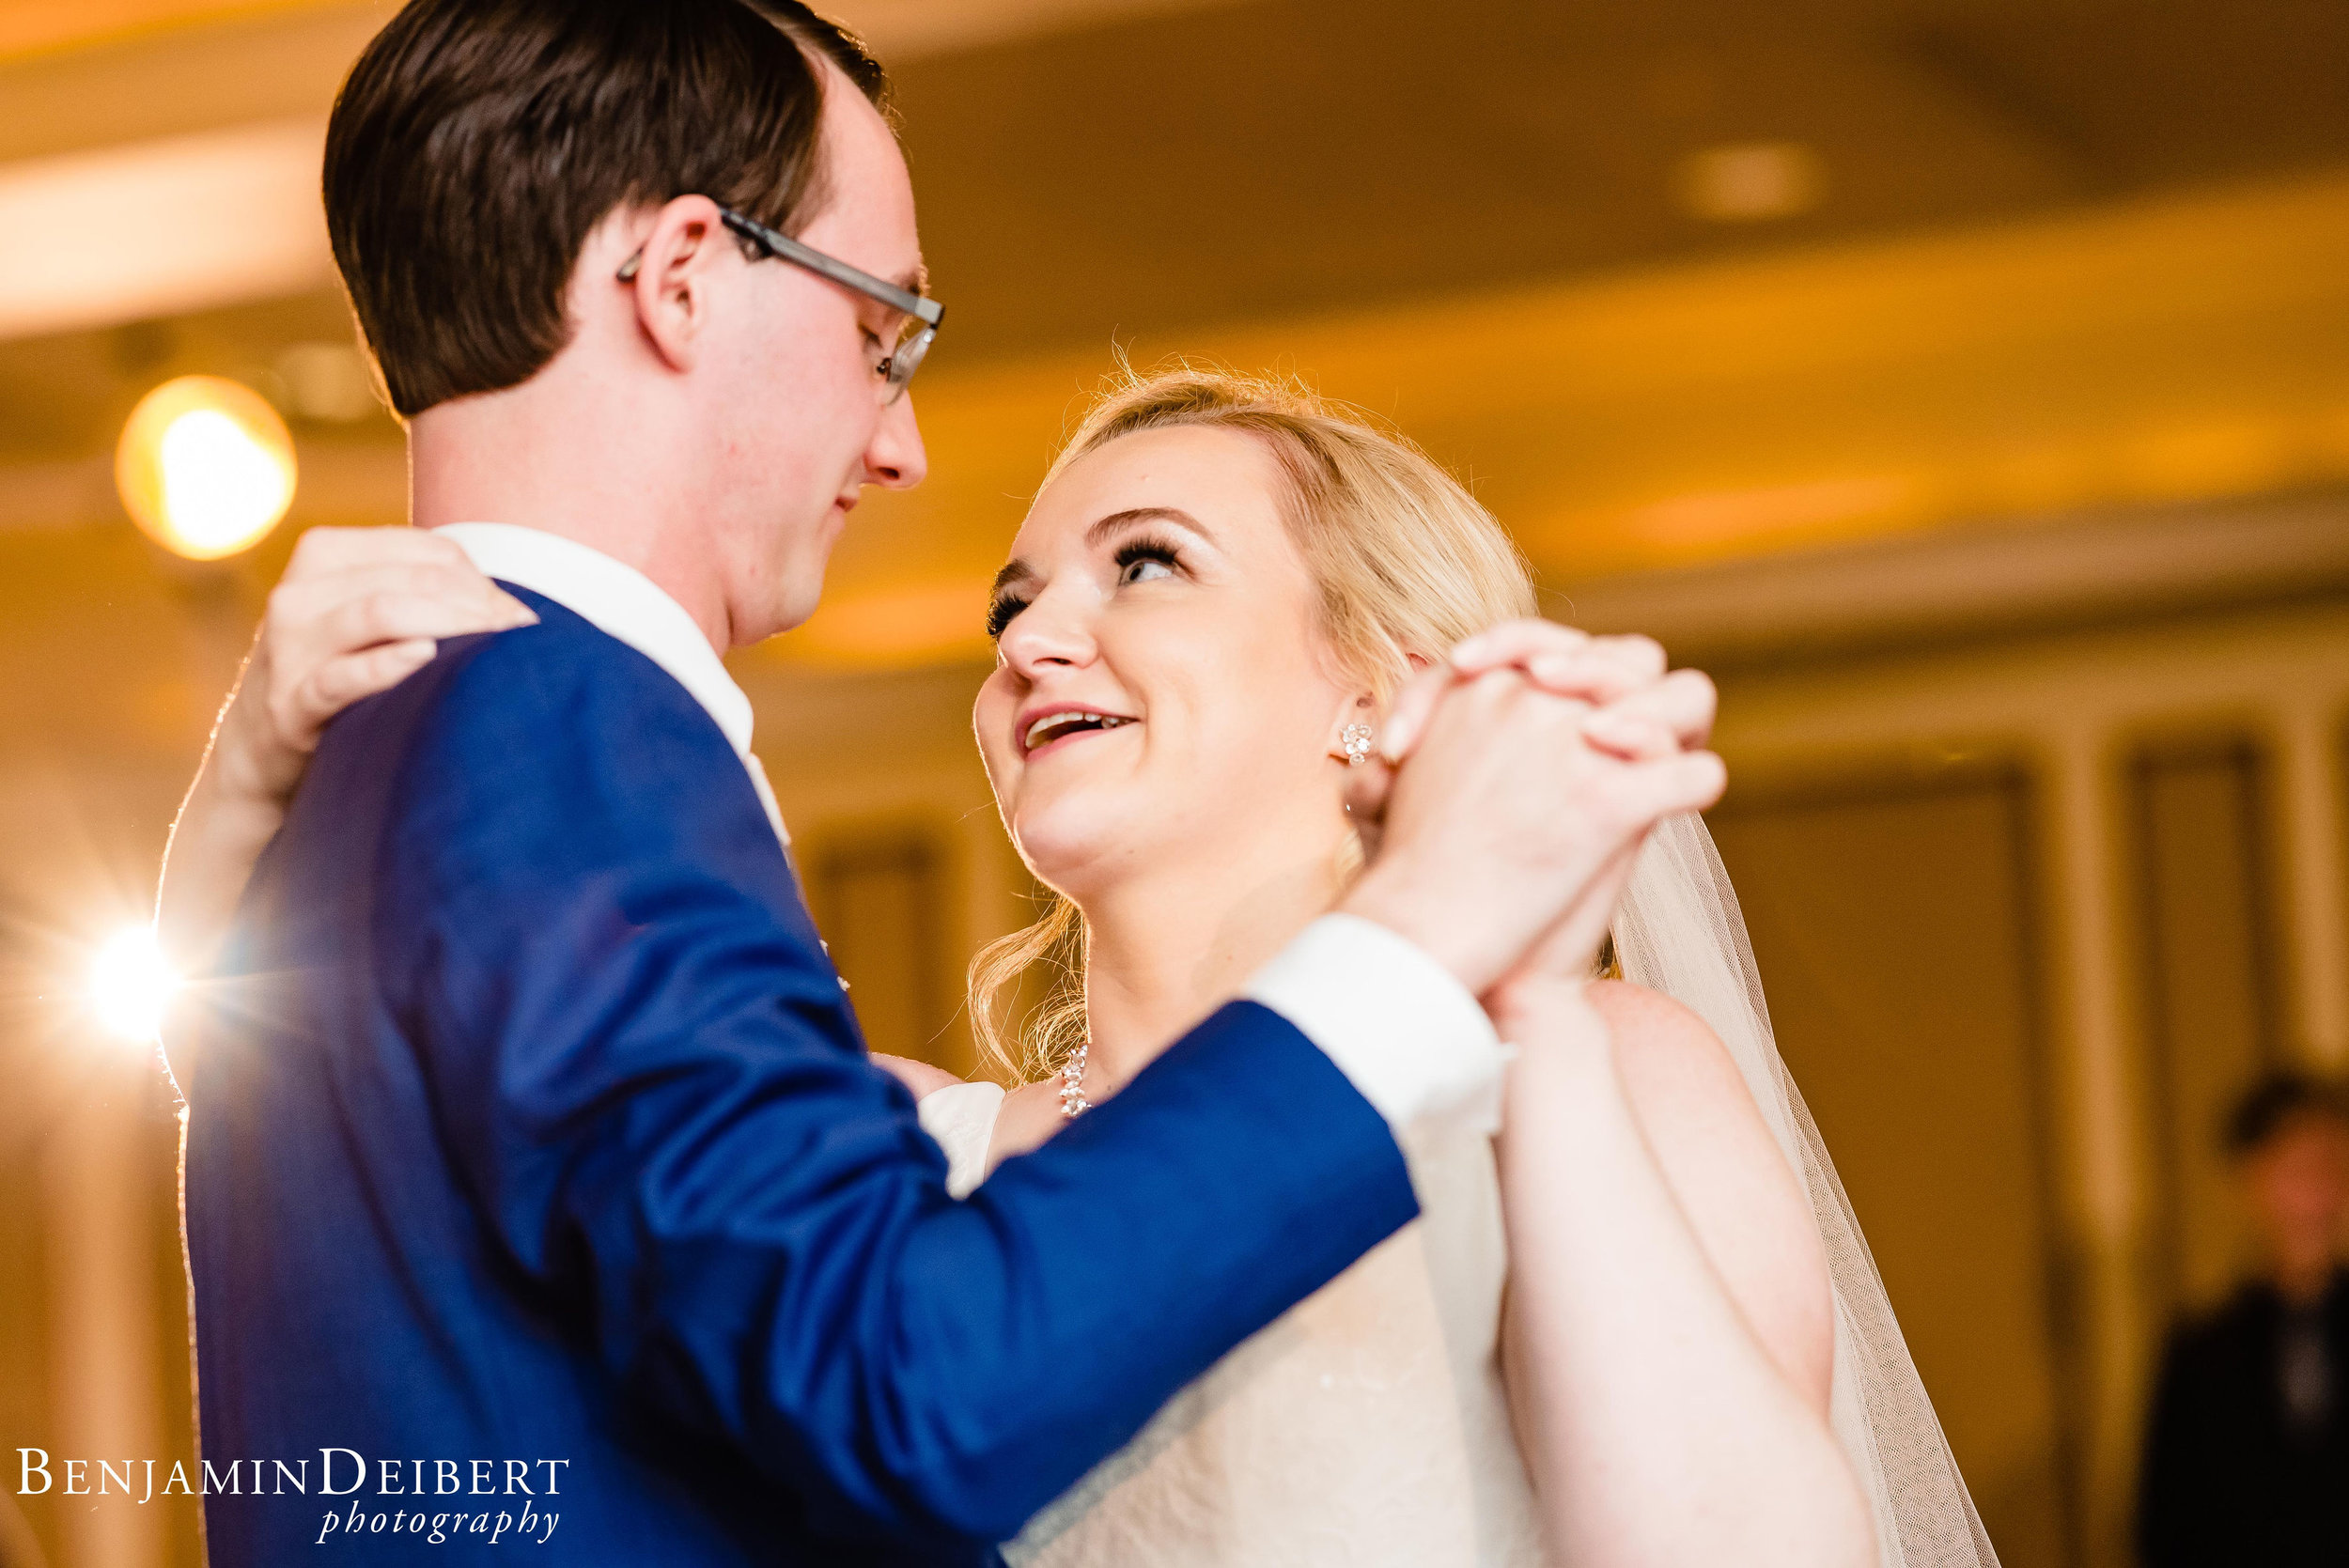 AshleyandDerrick_RadnorValleyCountryClub_Wedding-58.jpg